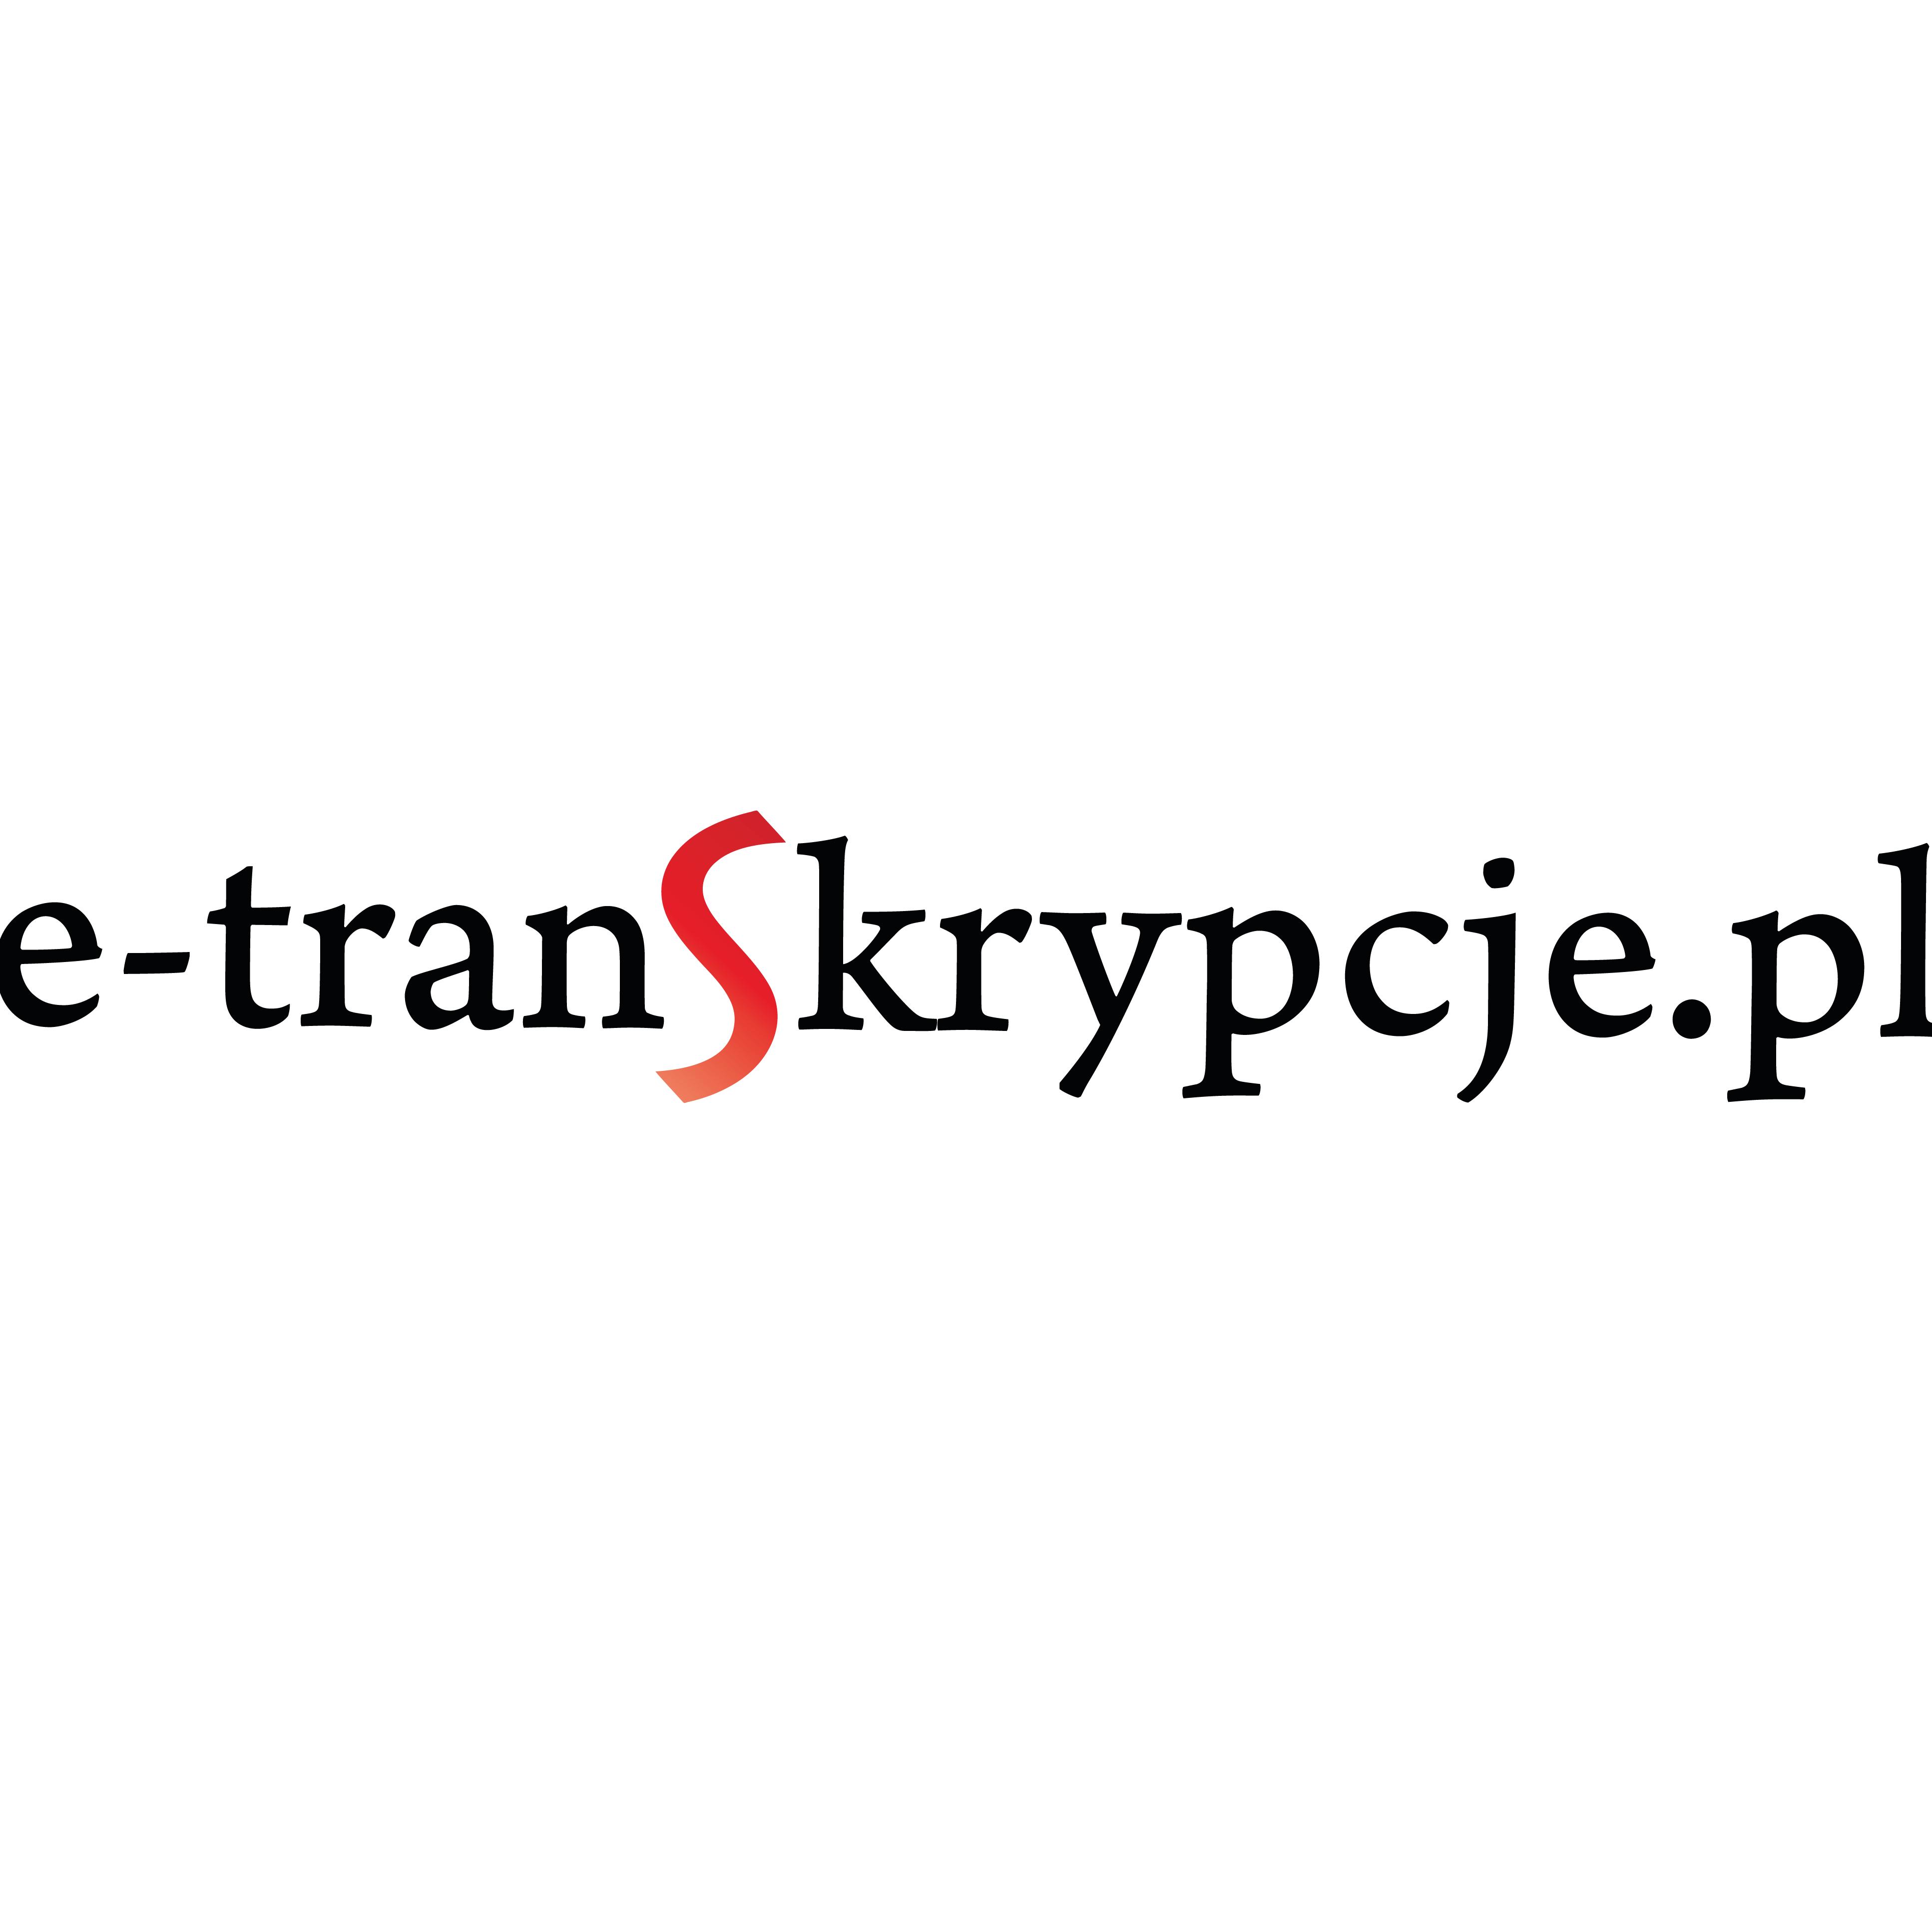 e-transkrypcje.pl